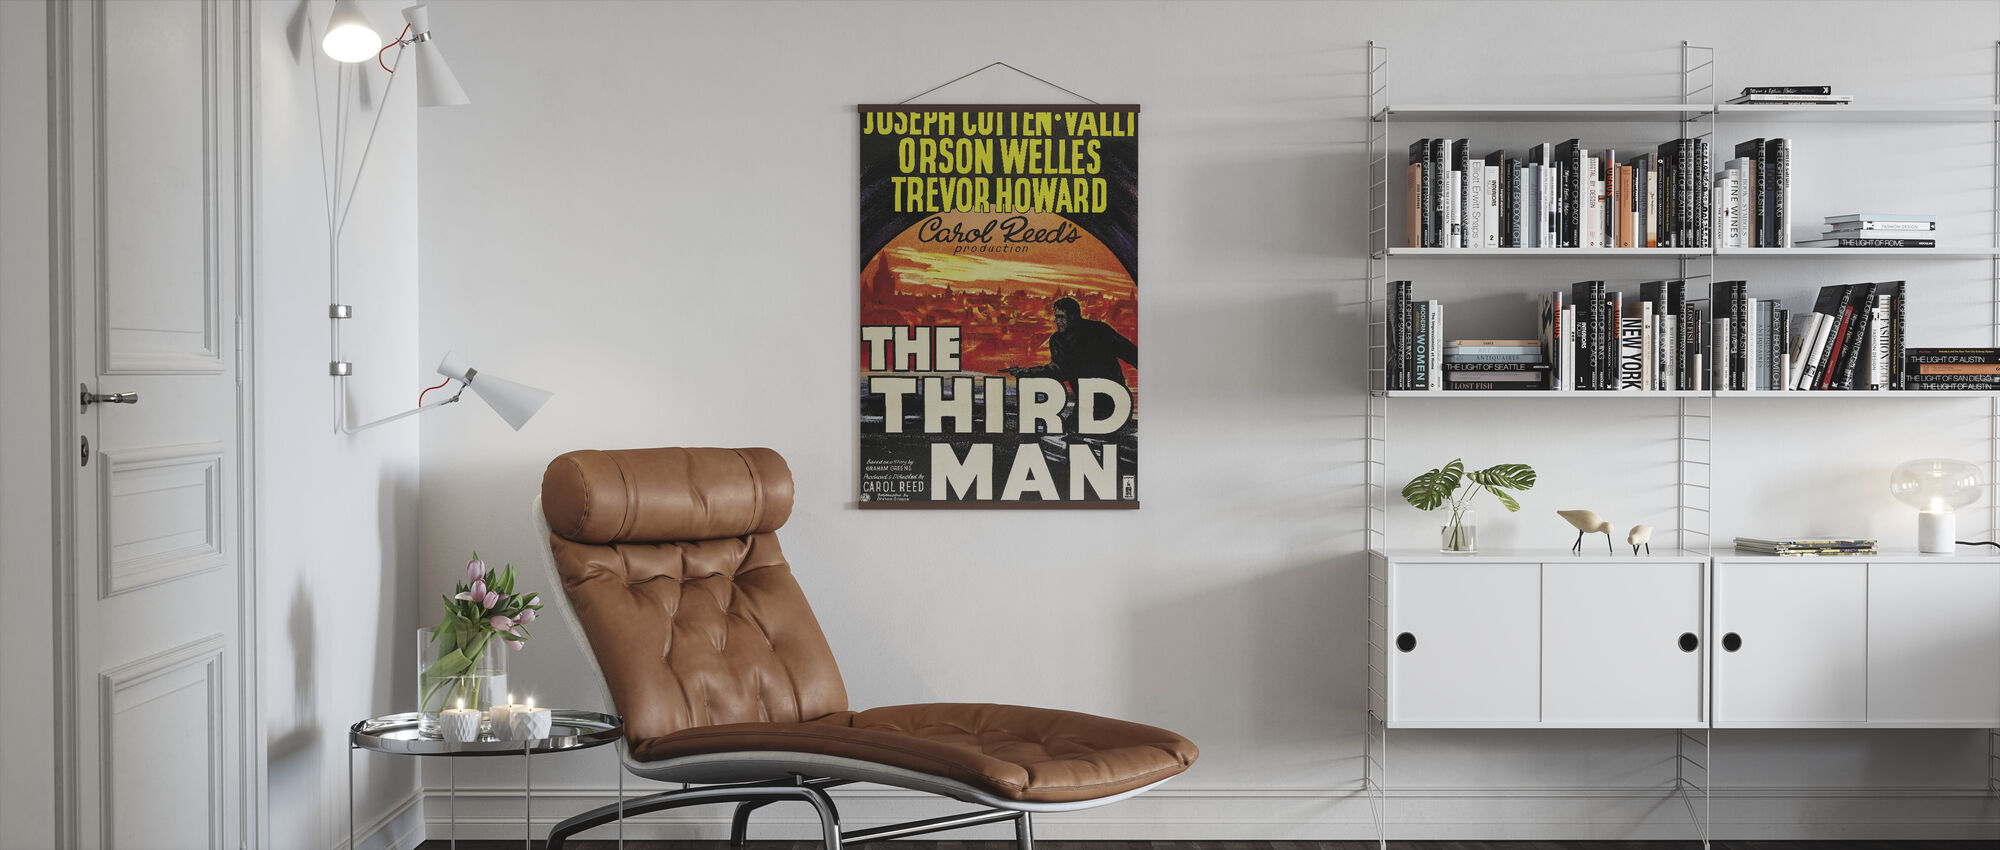 Third Man - Poster - Living Room